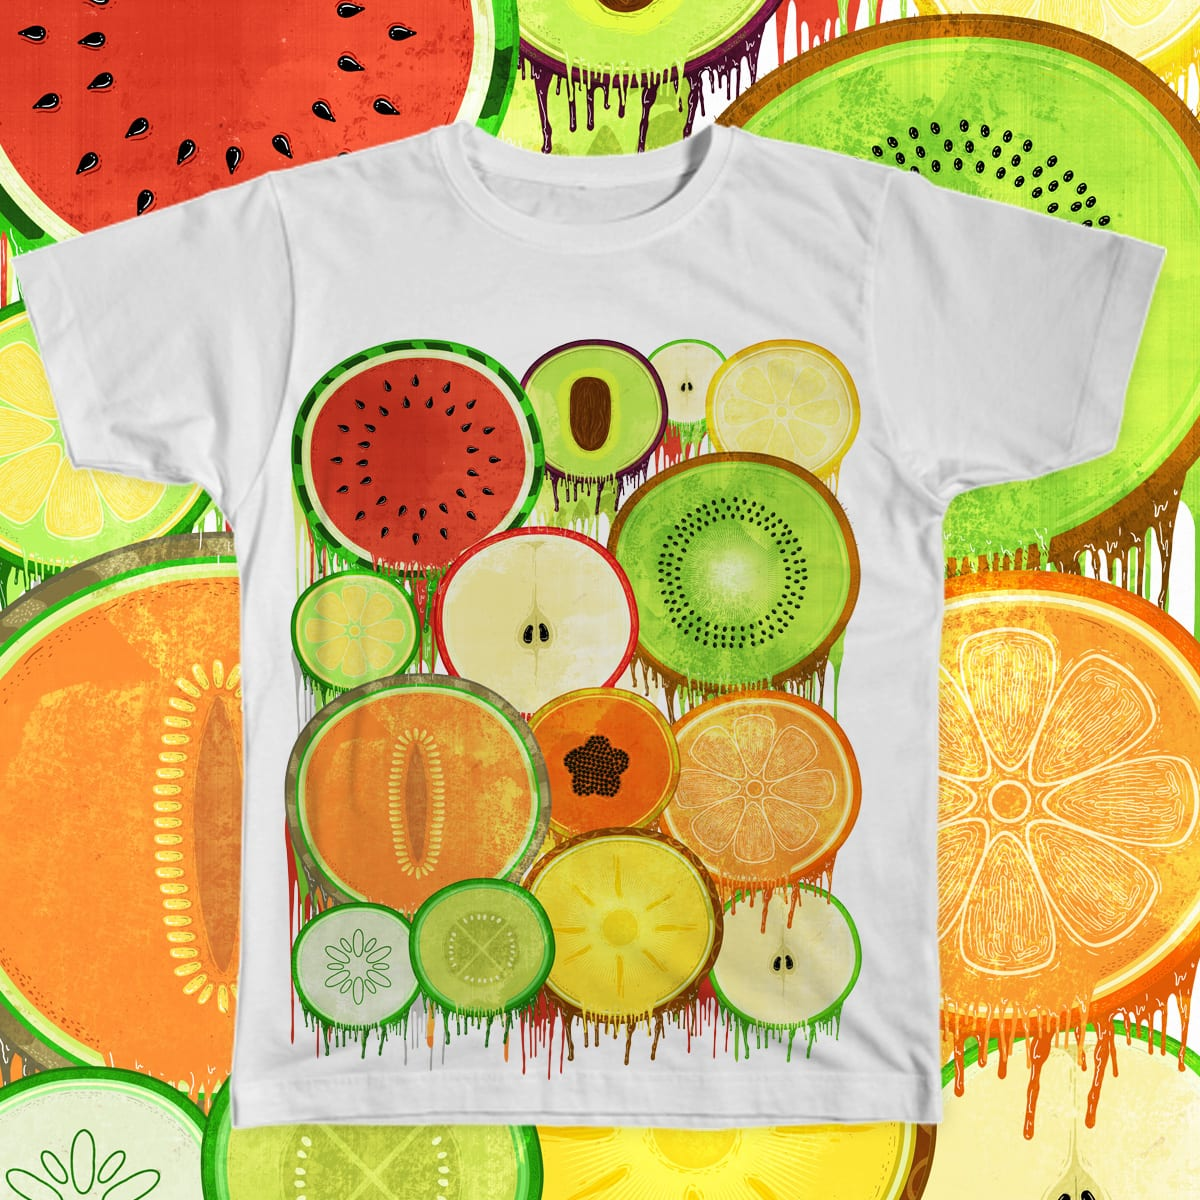 fresh fruity drips by gaci on Threadless